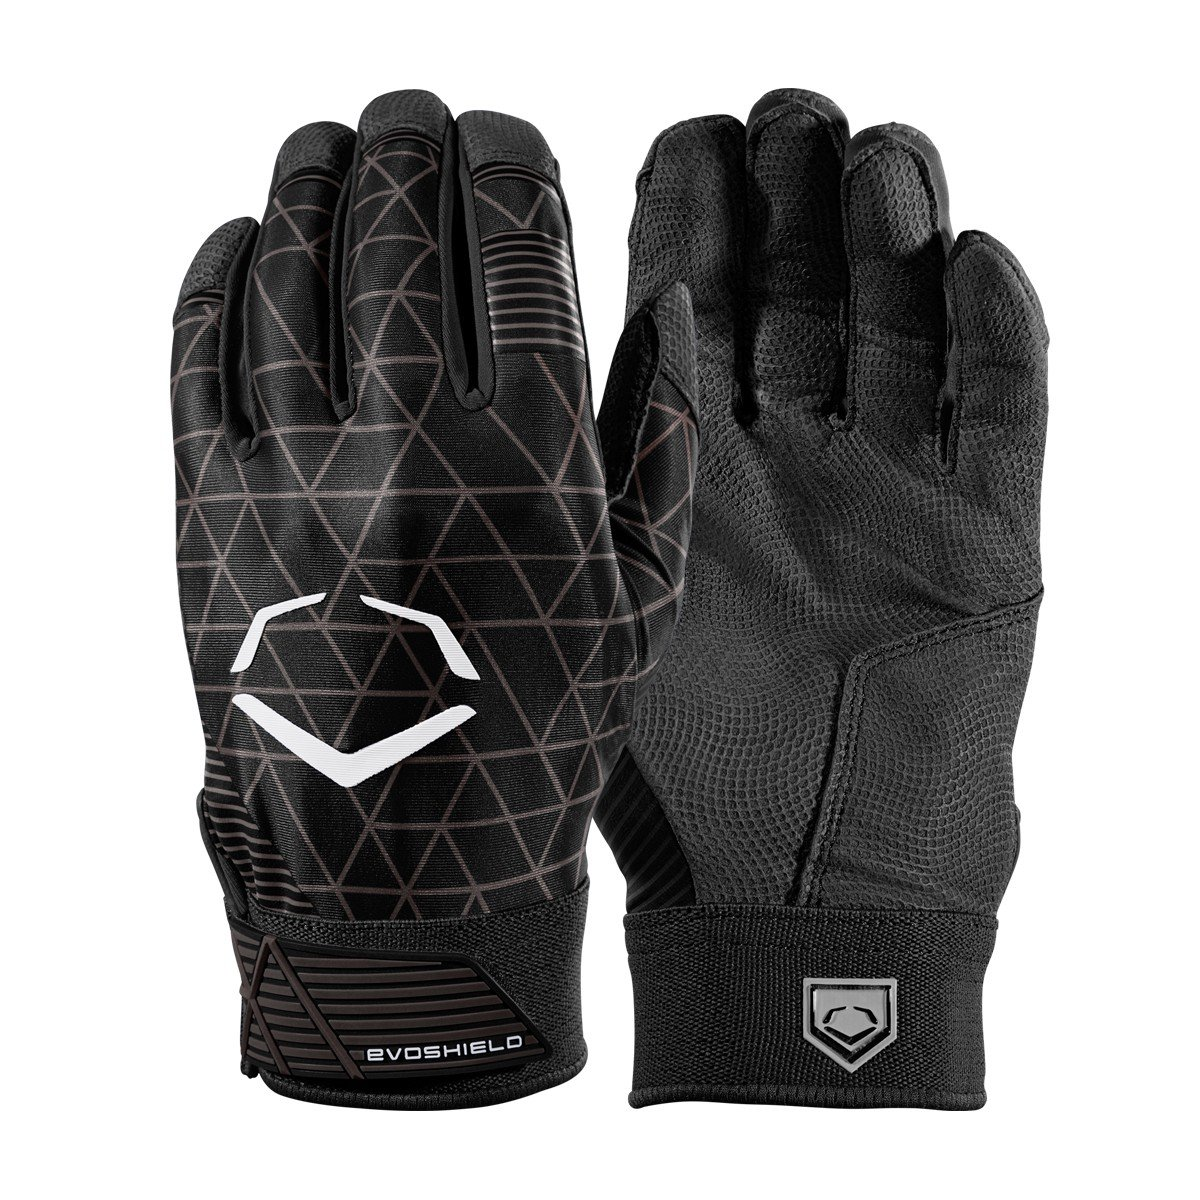 EvoShield evocharge Schutz Batting Handschuhe B0741JP6S8 Handschuhe Bestätigungsfeedback